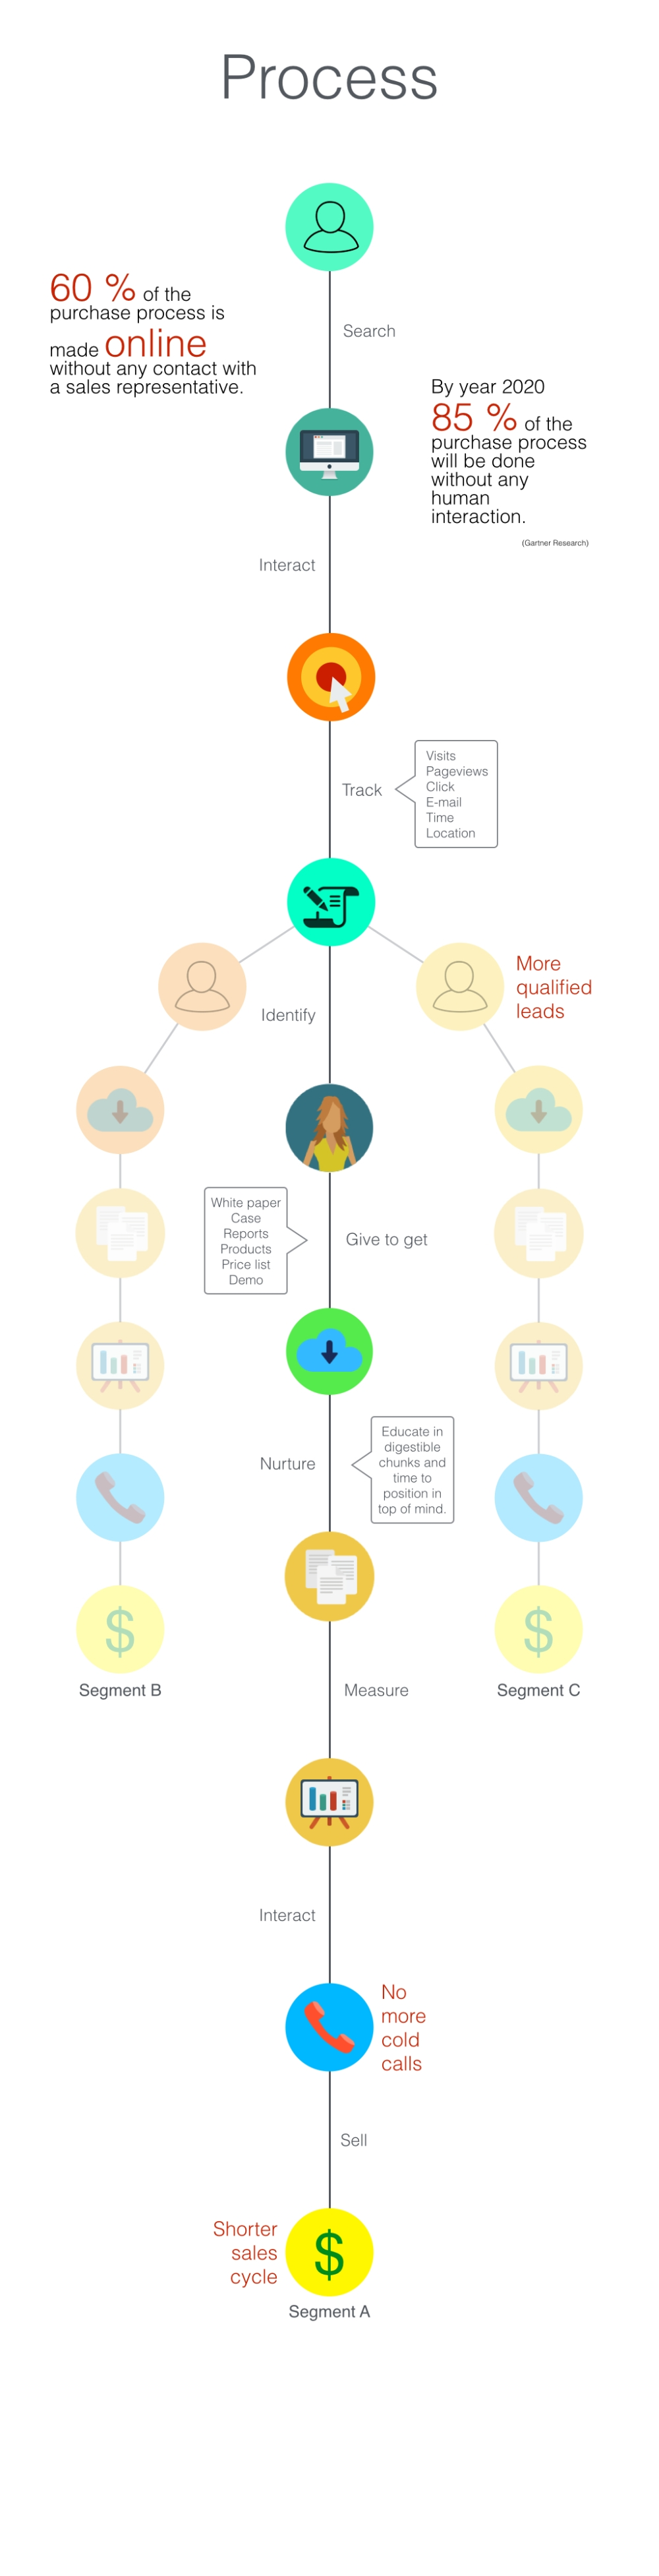 Marketing Automation Infographic.001